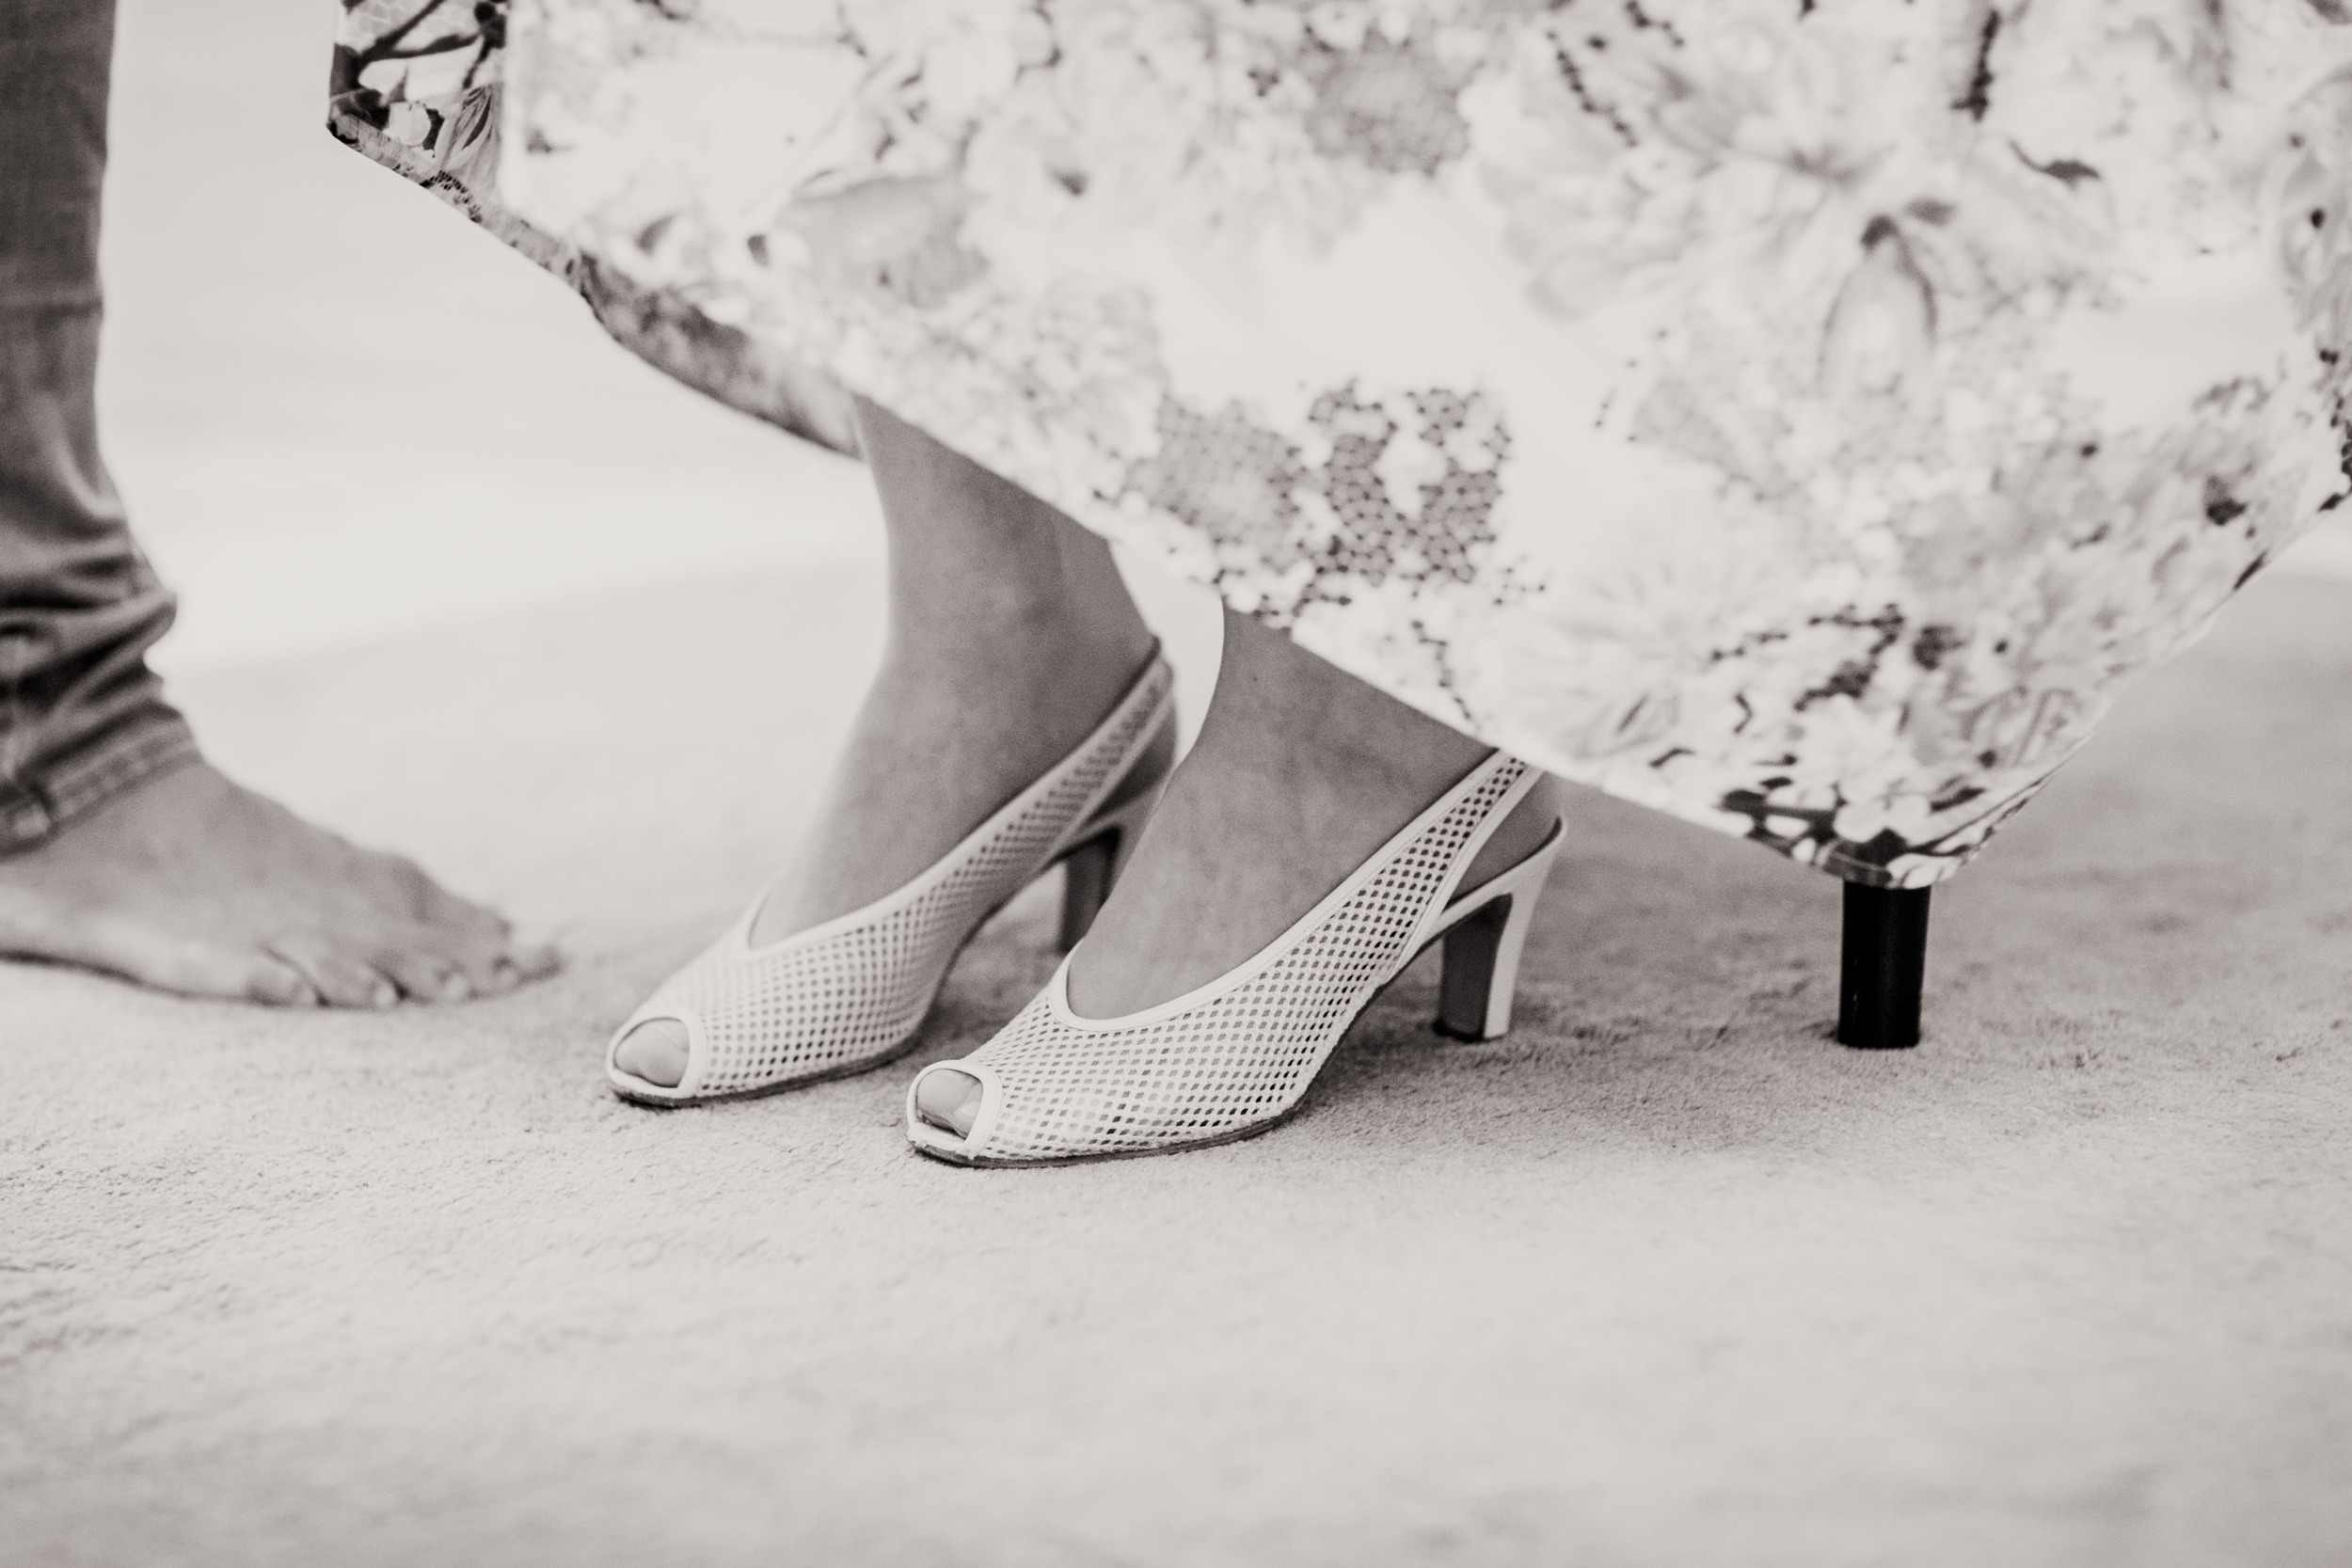 Fran Burrows Hochzeitsfotografie Berlin_Hotel Adlon-29.jpg